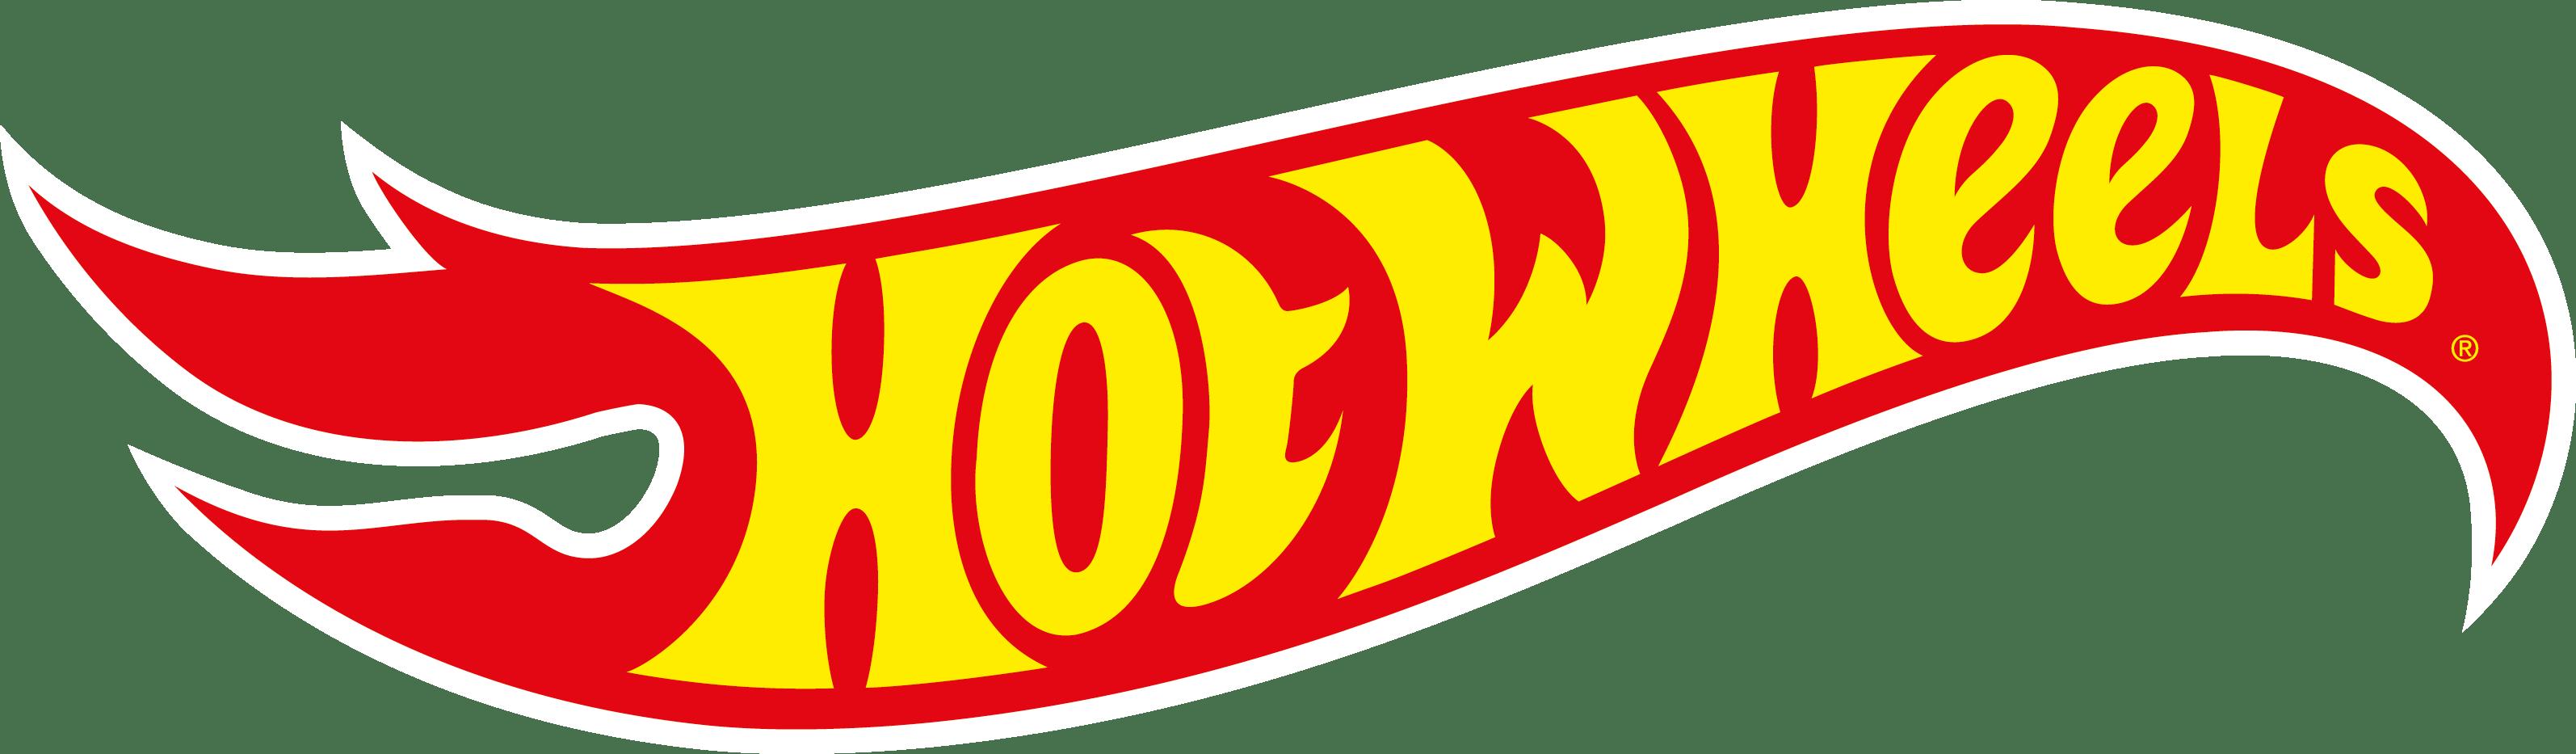 Hot Wheels Logo png